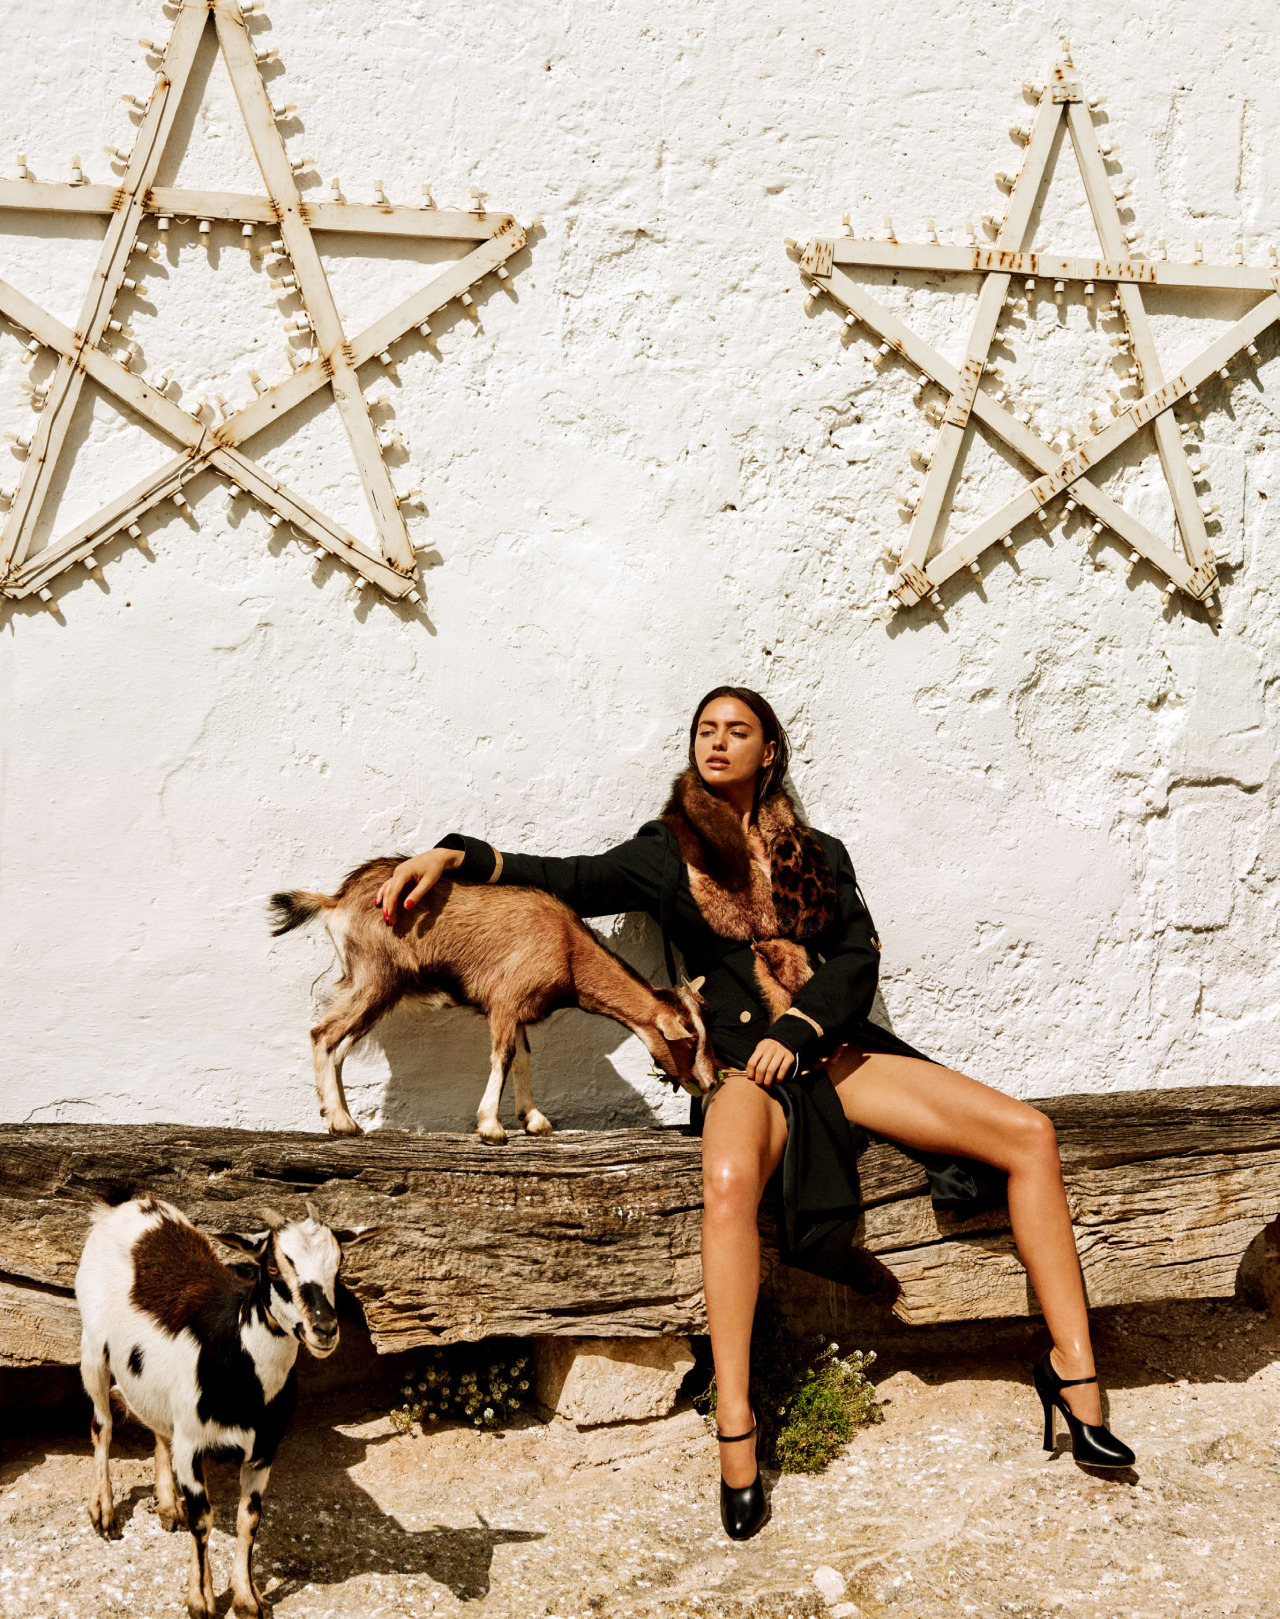 Irina Shayk In The Sun Of Italy Vogue Japan September 2016 / Giampaolo Sgura